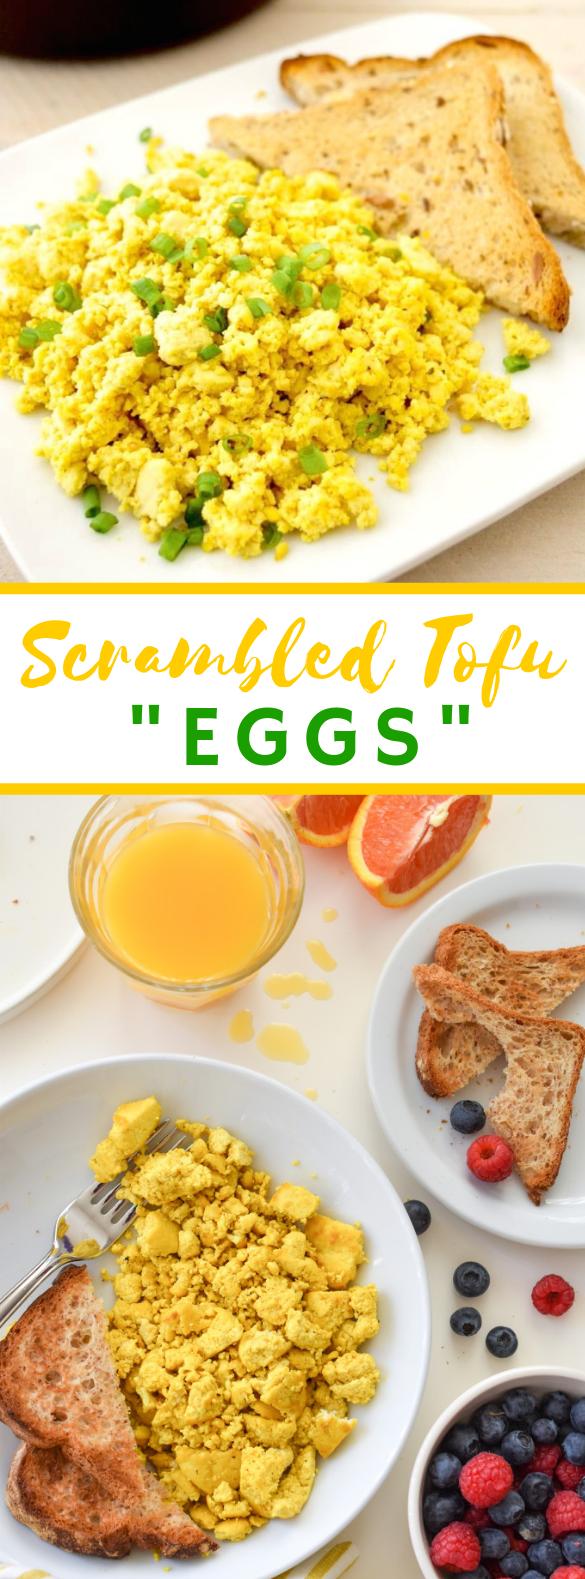 TOFU SCRAMBLED EGGS #vegetarian #breakfast